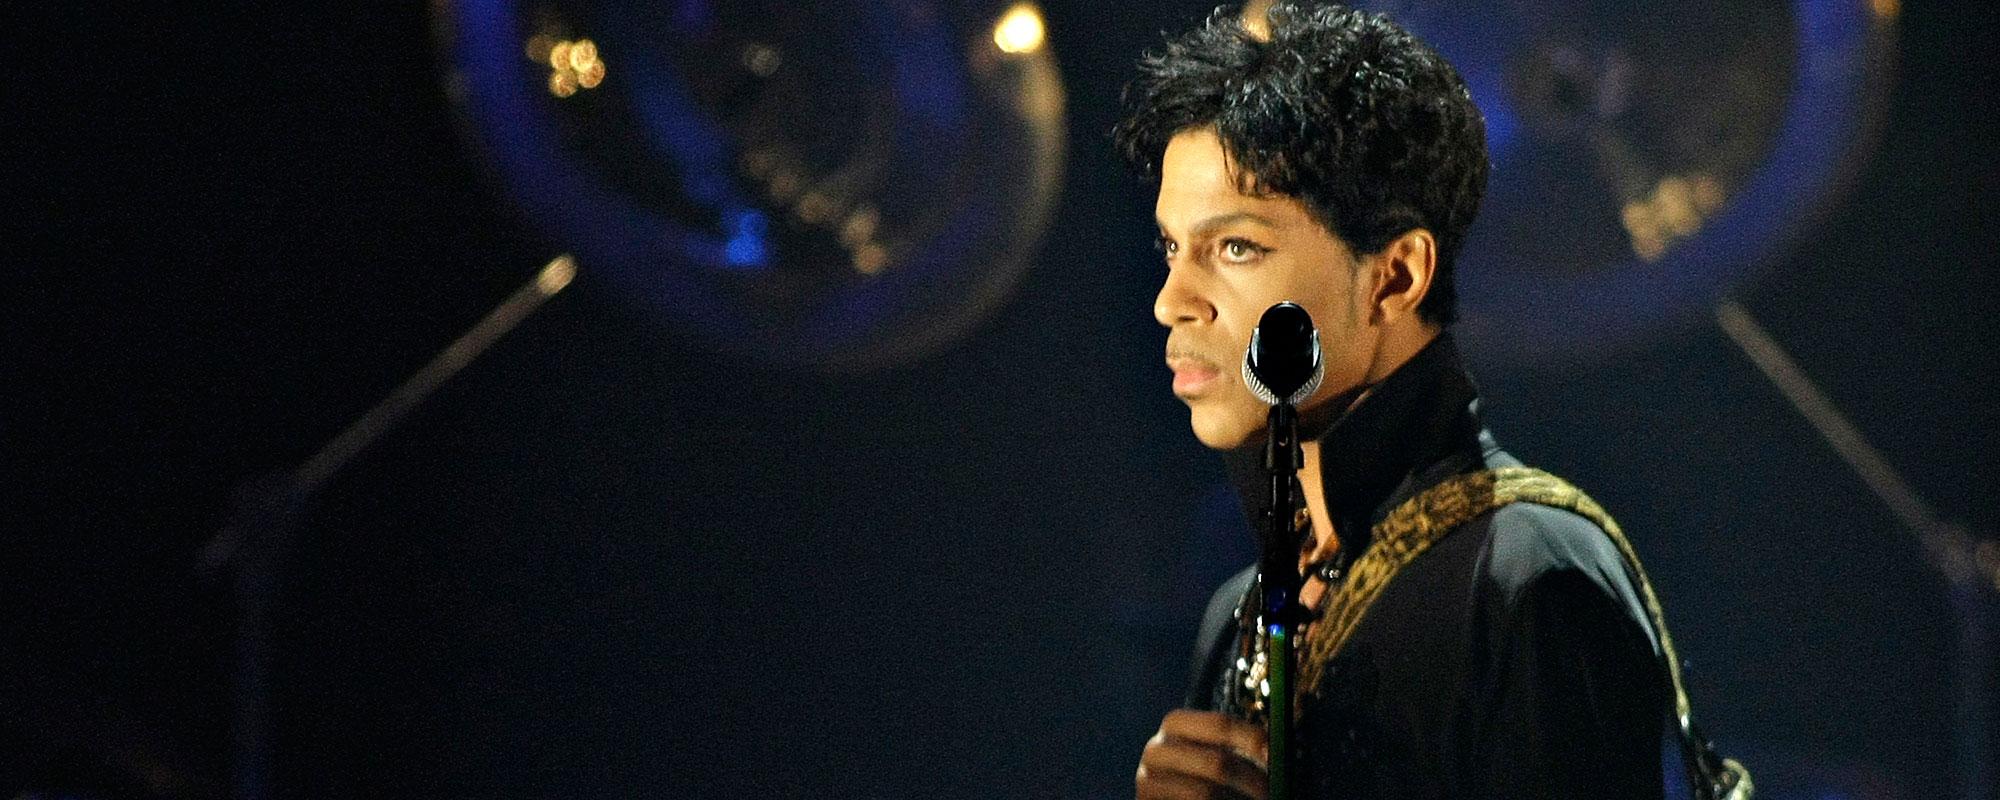 prince-photo-live1